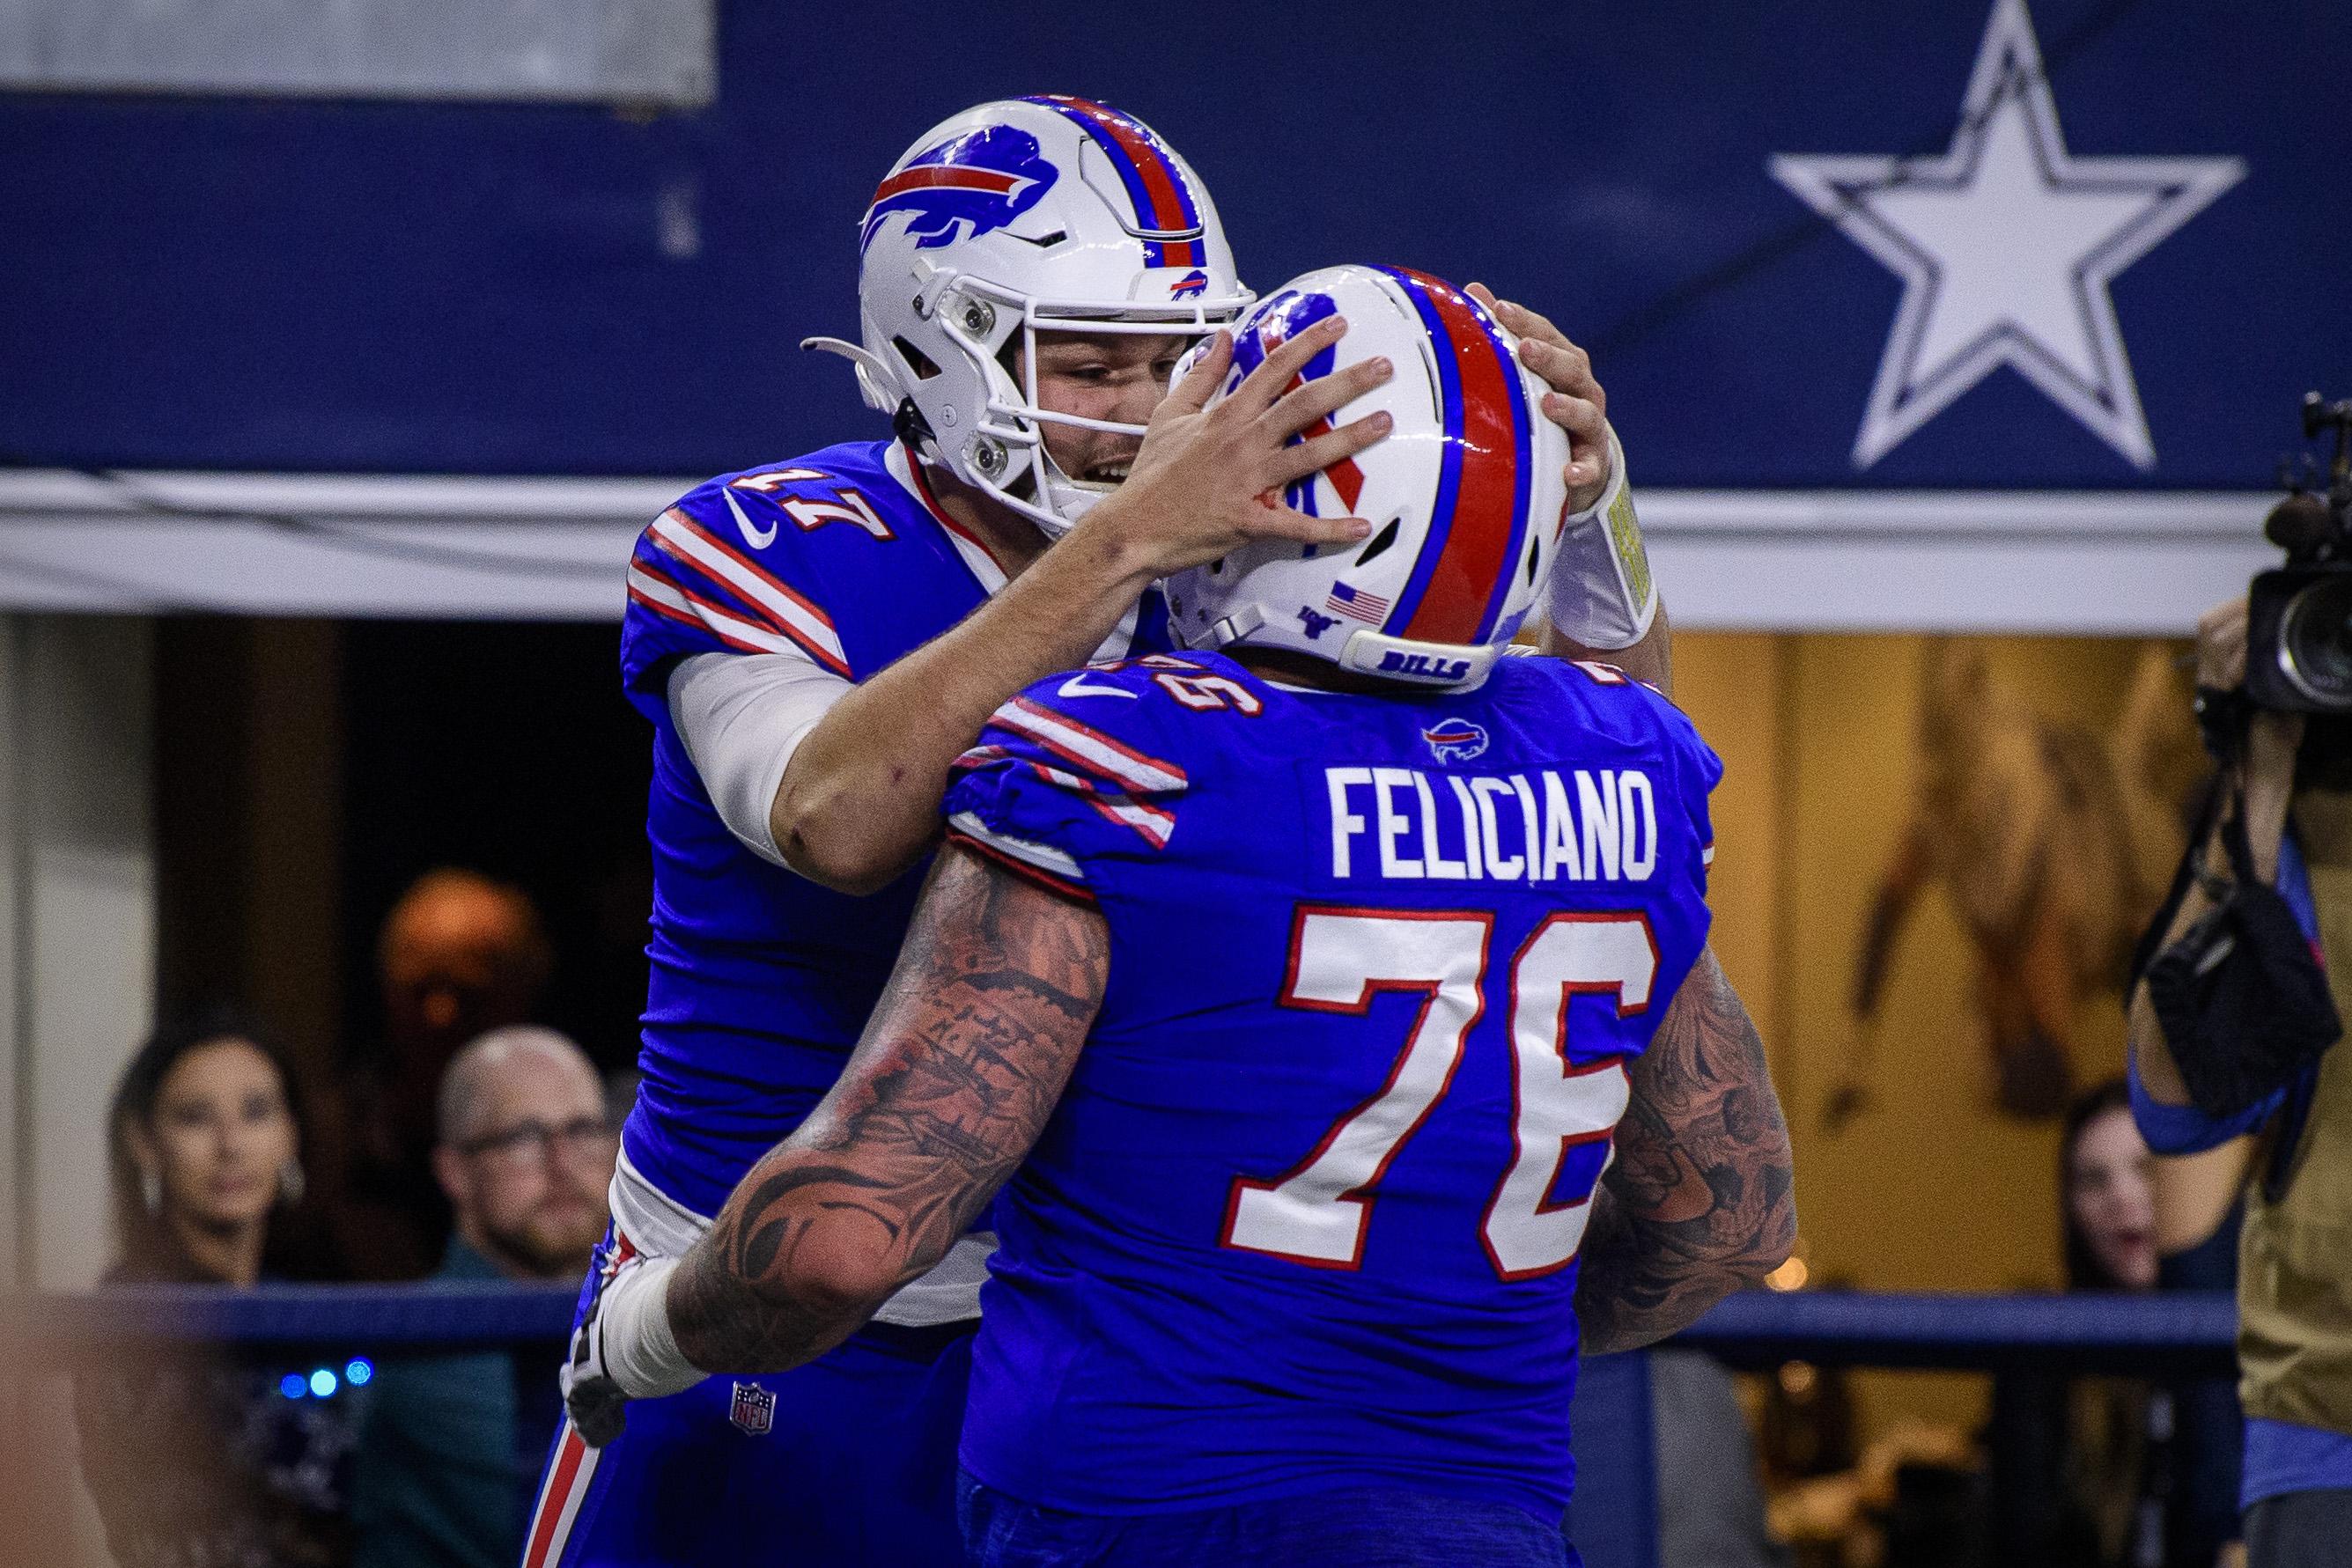 Guard Jon Feliciano Shares He Had Offseason Surgery